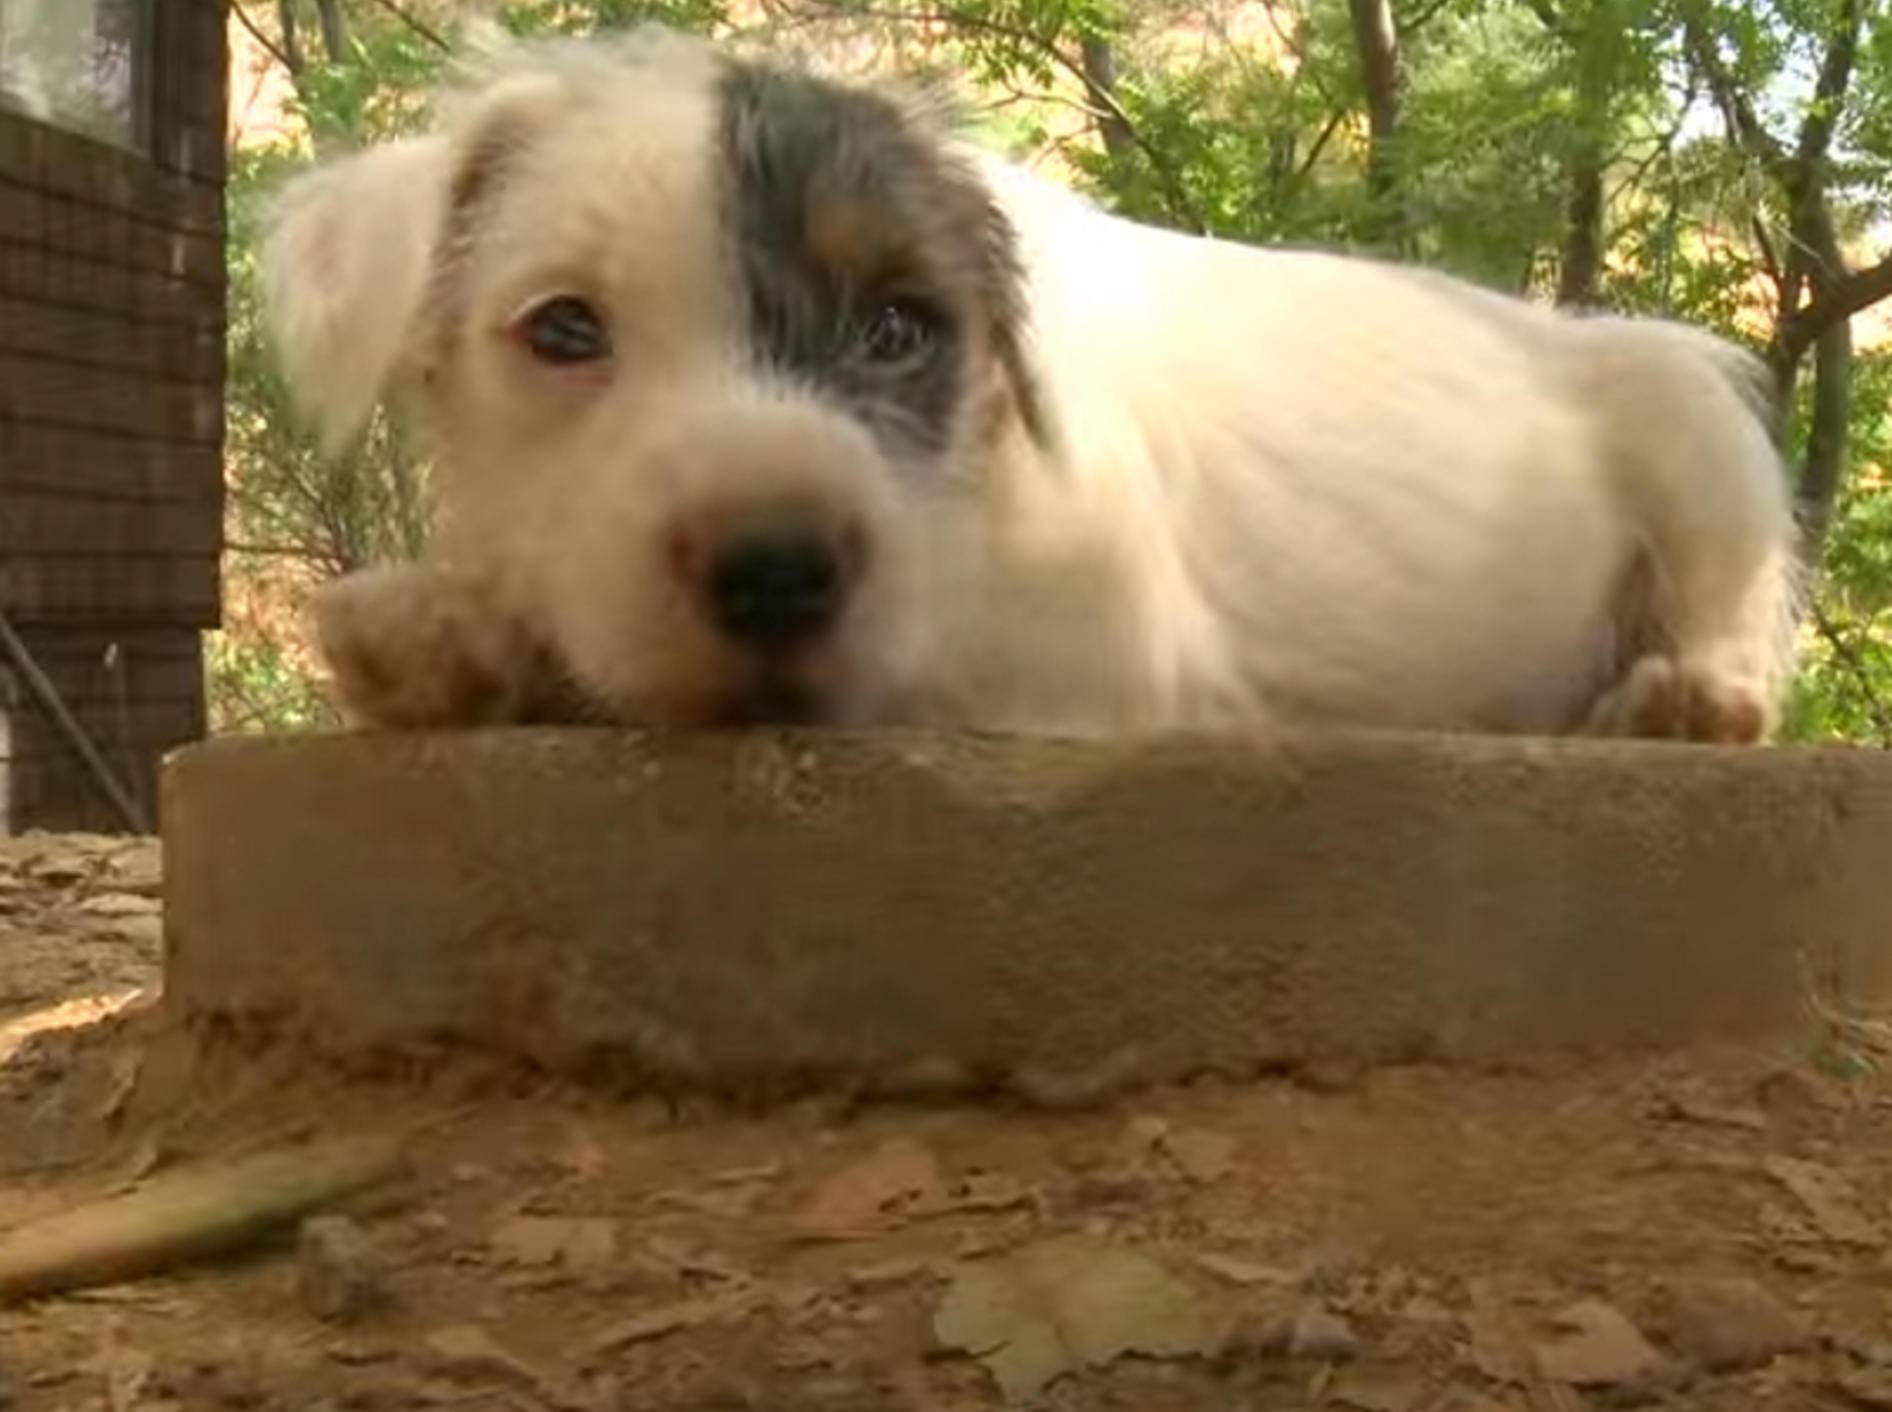 Total vergnügt: Parson Russell Terrier toben im Garten – Bild: YouTube / The Pet Collective